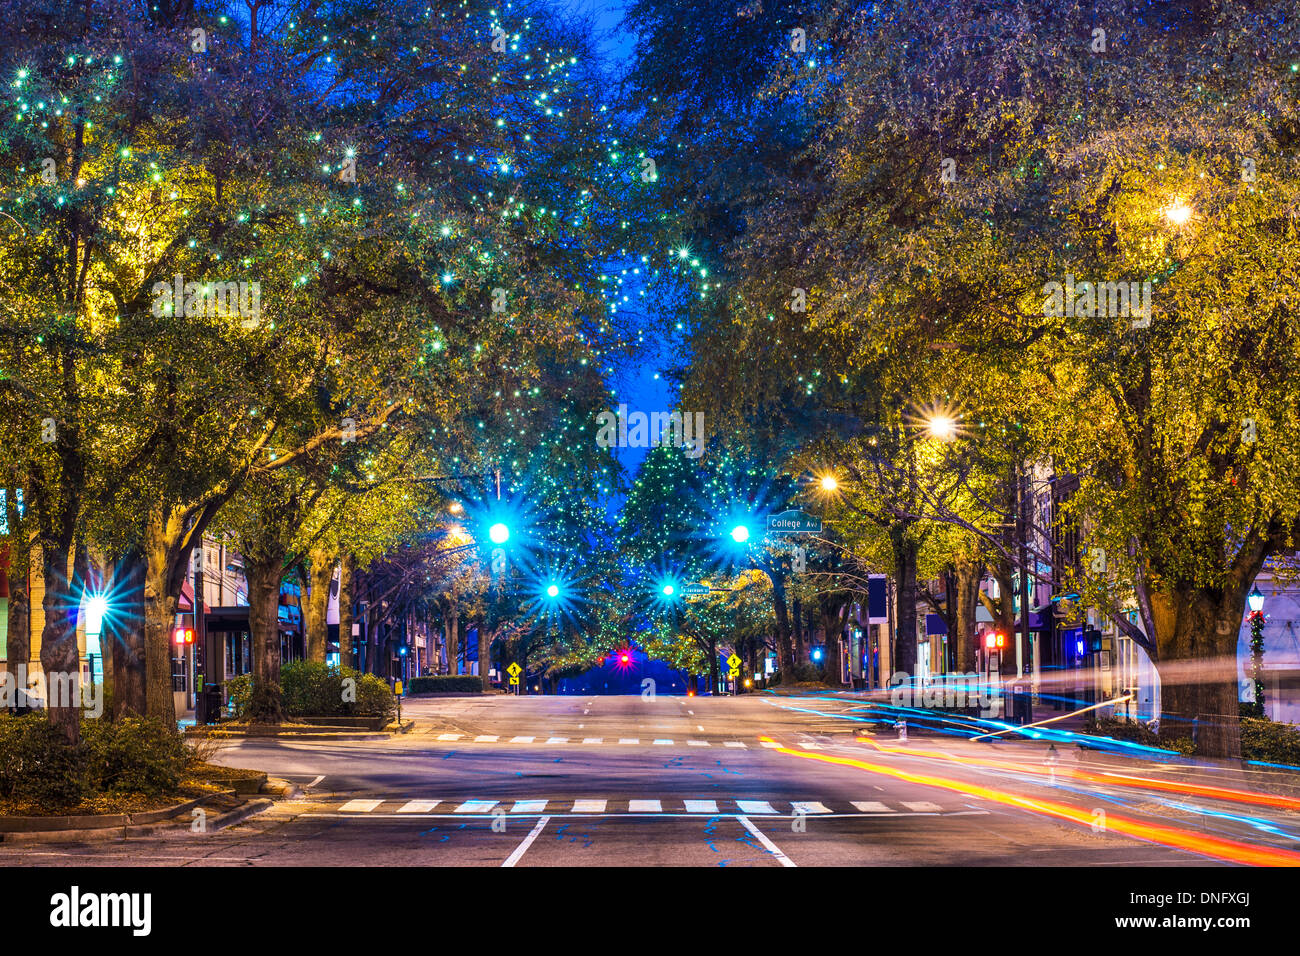 Downtown Athens, Georgia, USA night scene. - Stock Image